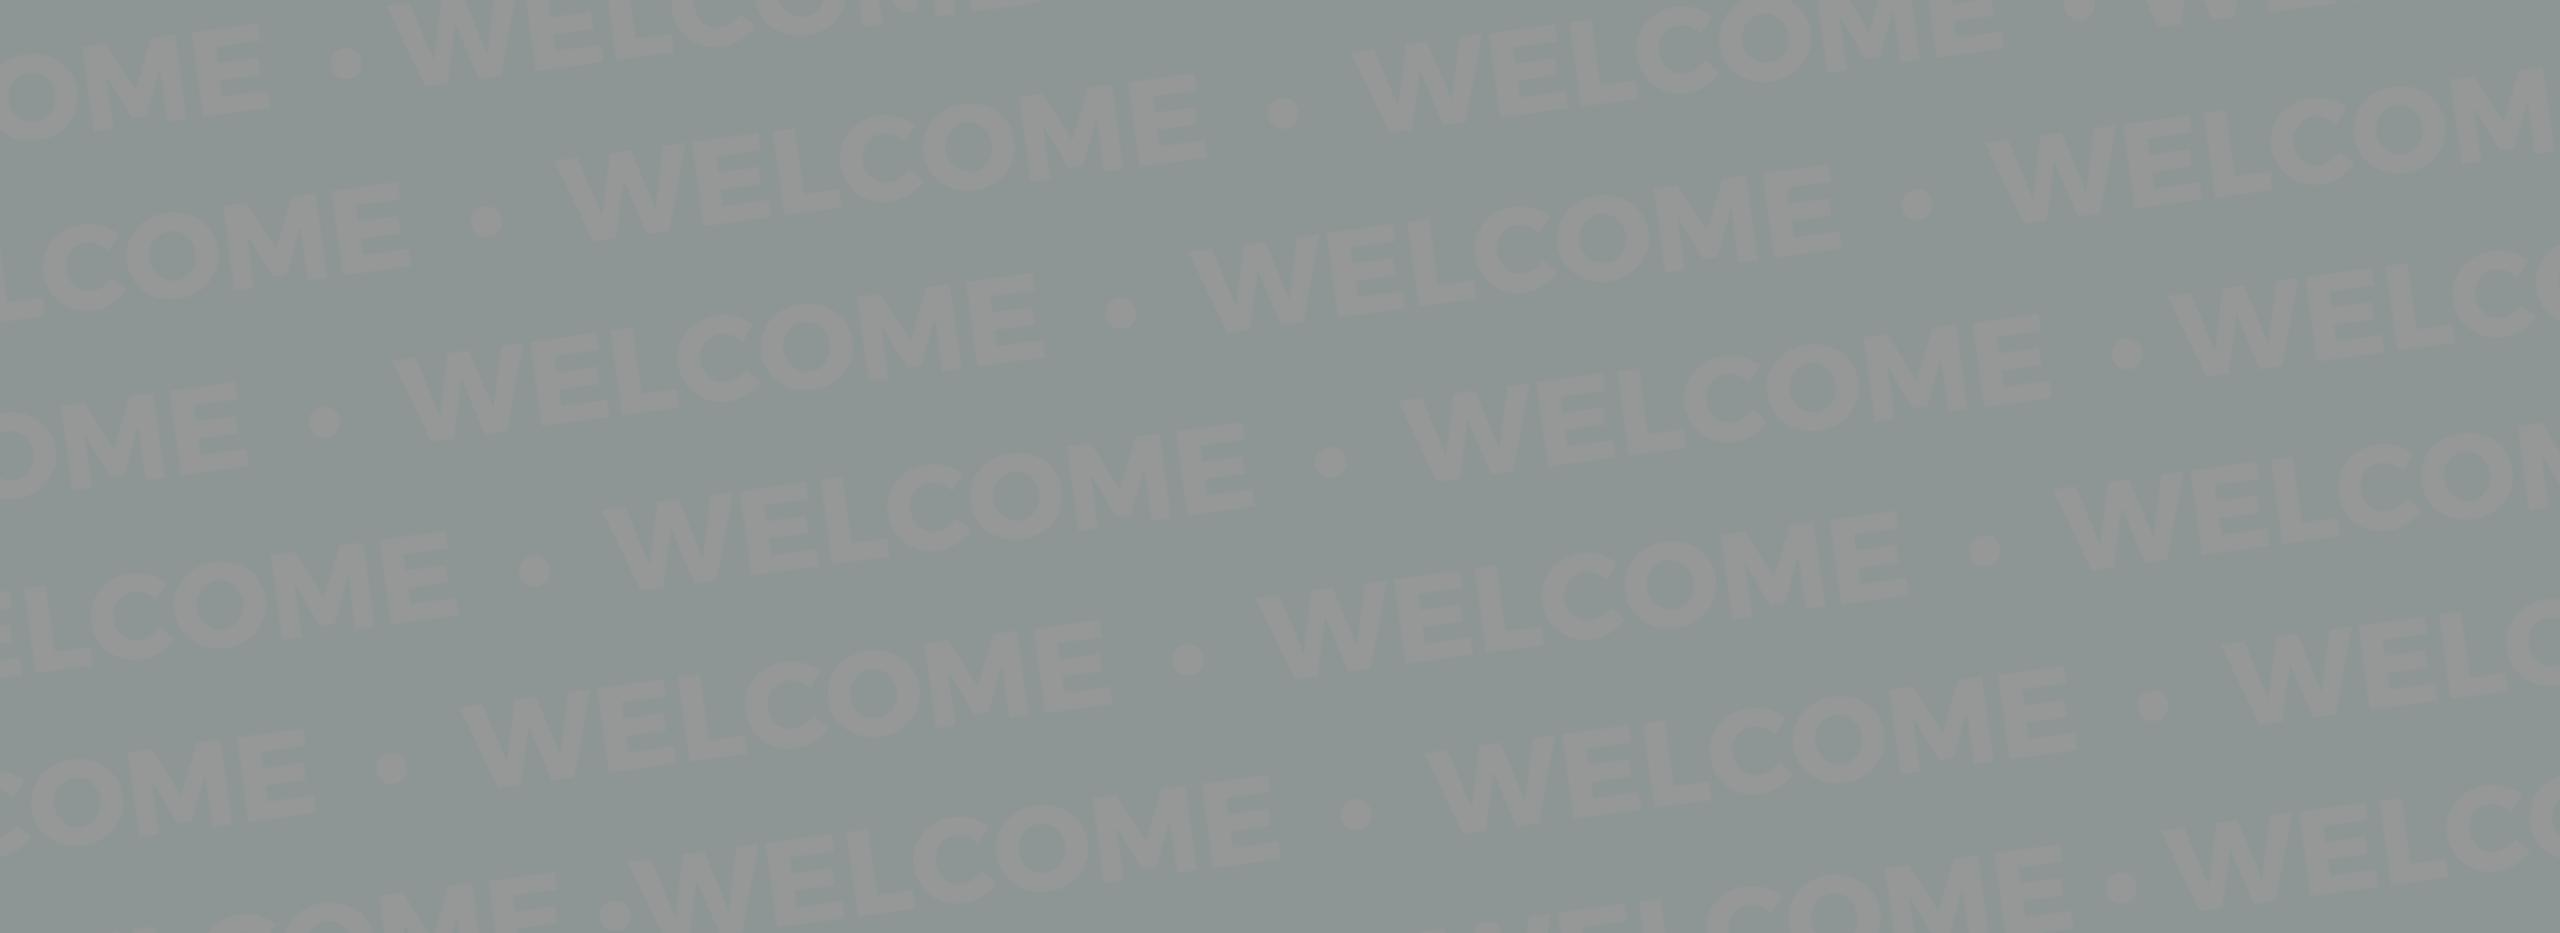 MRE | AP Welcomes New Agent Tamara Harrison